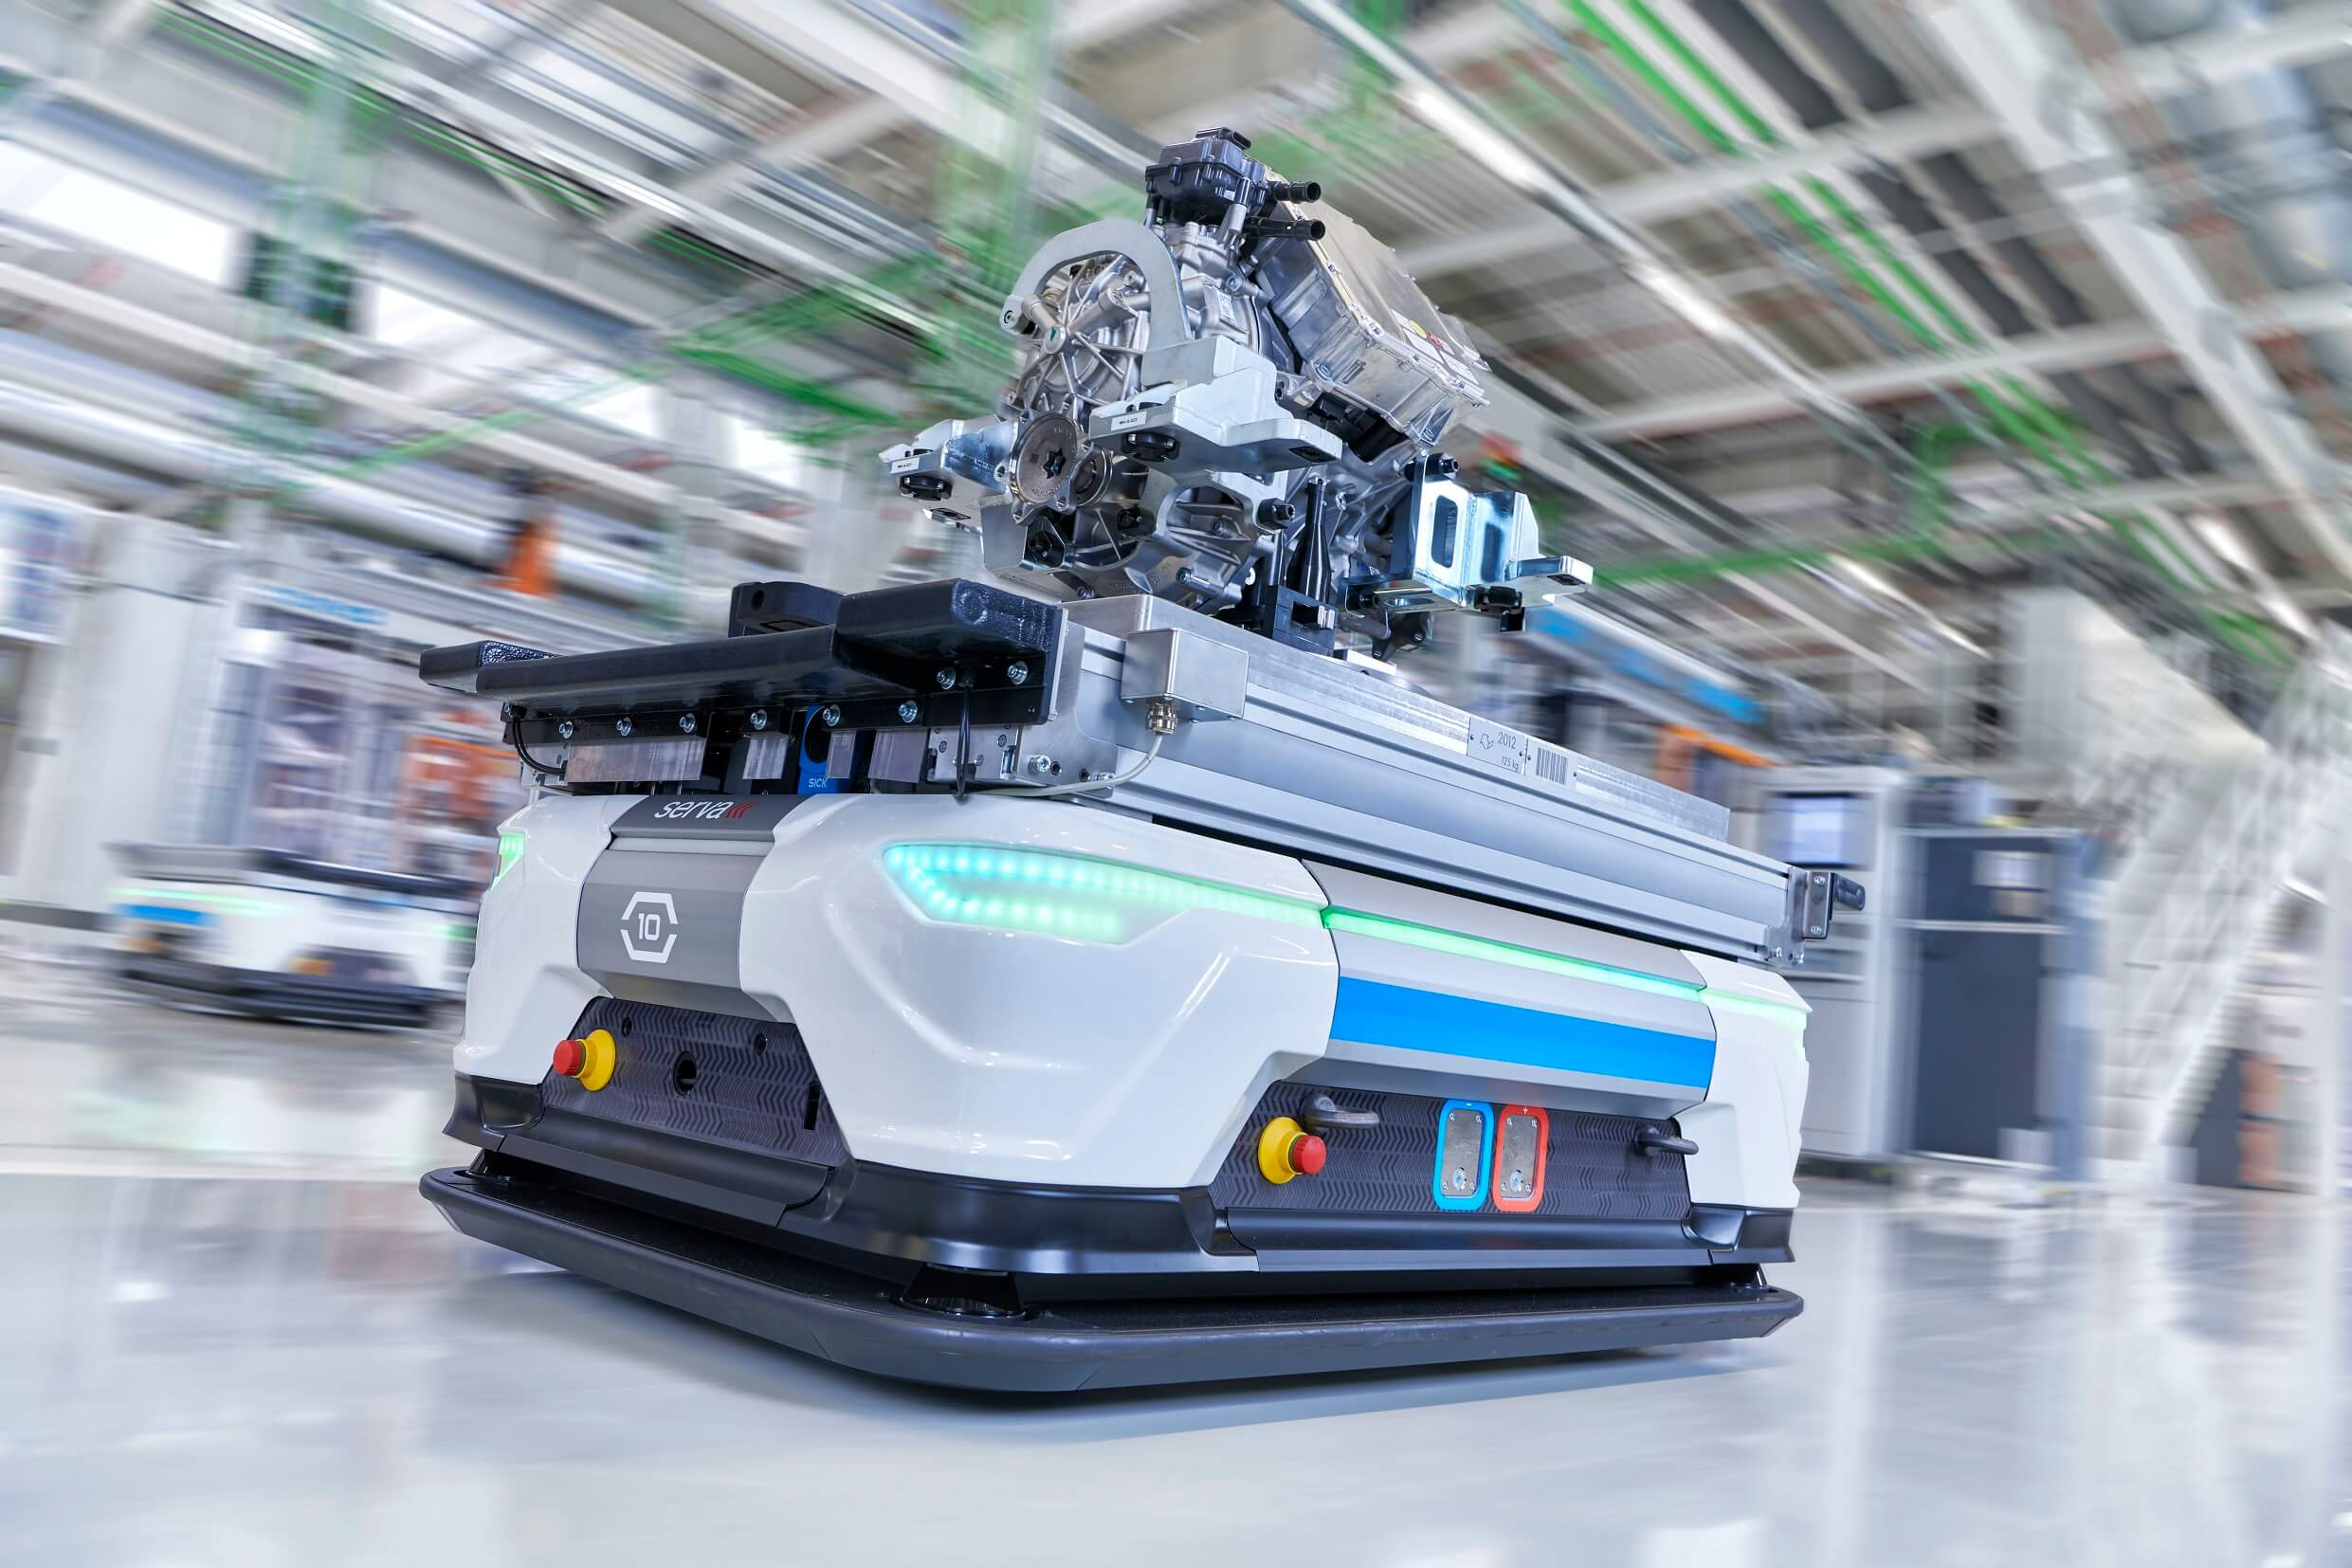 AUDI Smart Plant - Συστήματα μεταφοράς χωρίς οδηγό